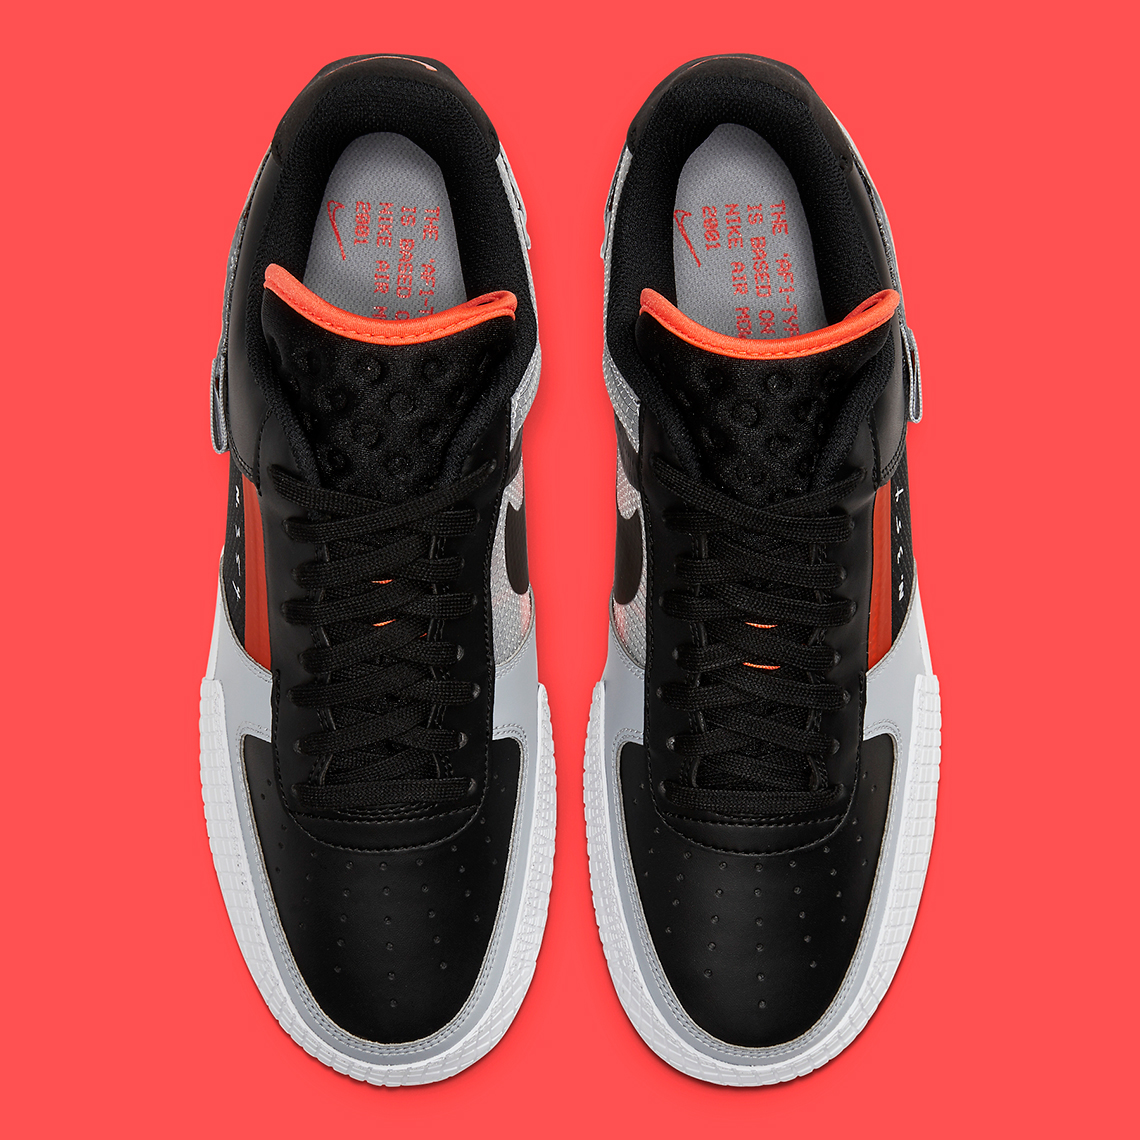 Nike Air Force 1 Type Hyper Crimson CQ2344 001 Release Info